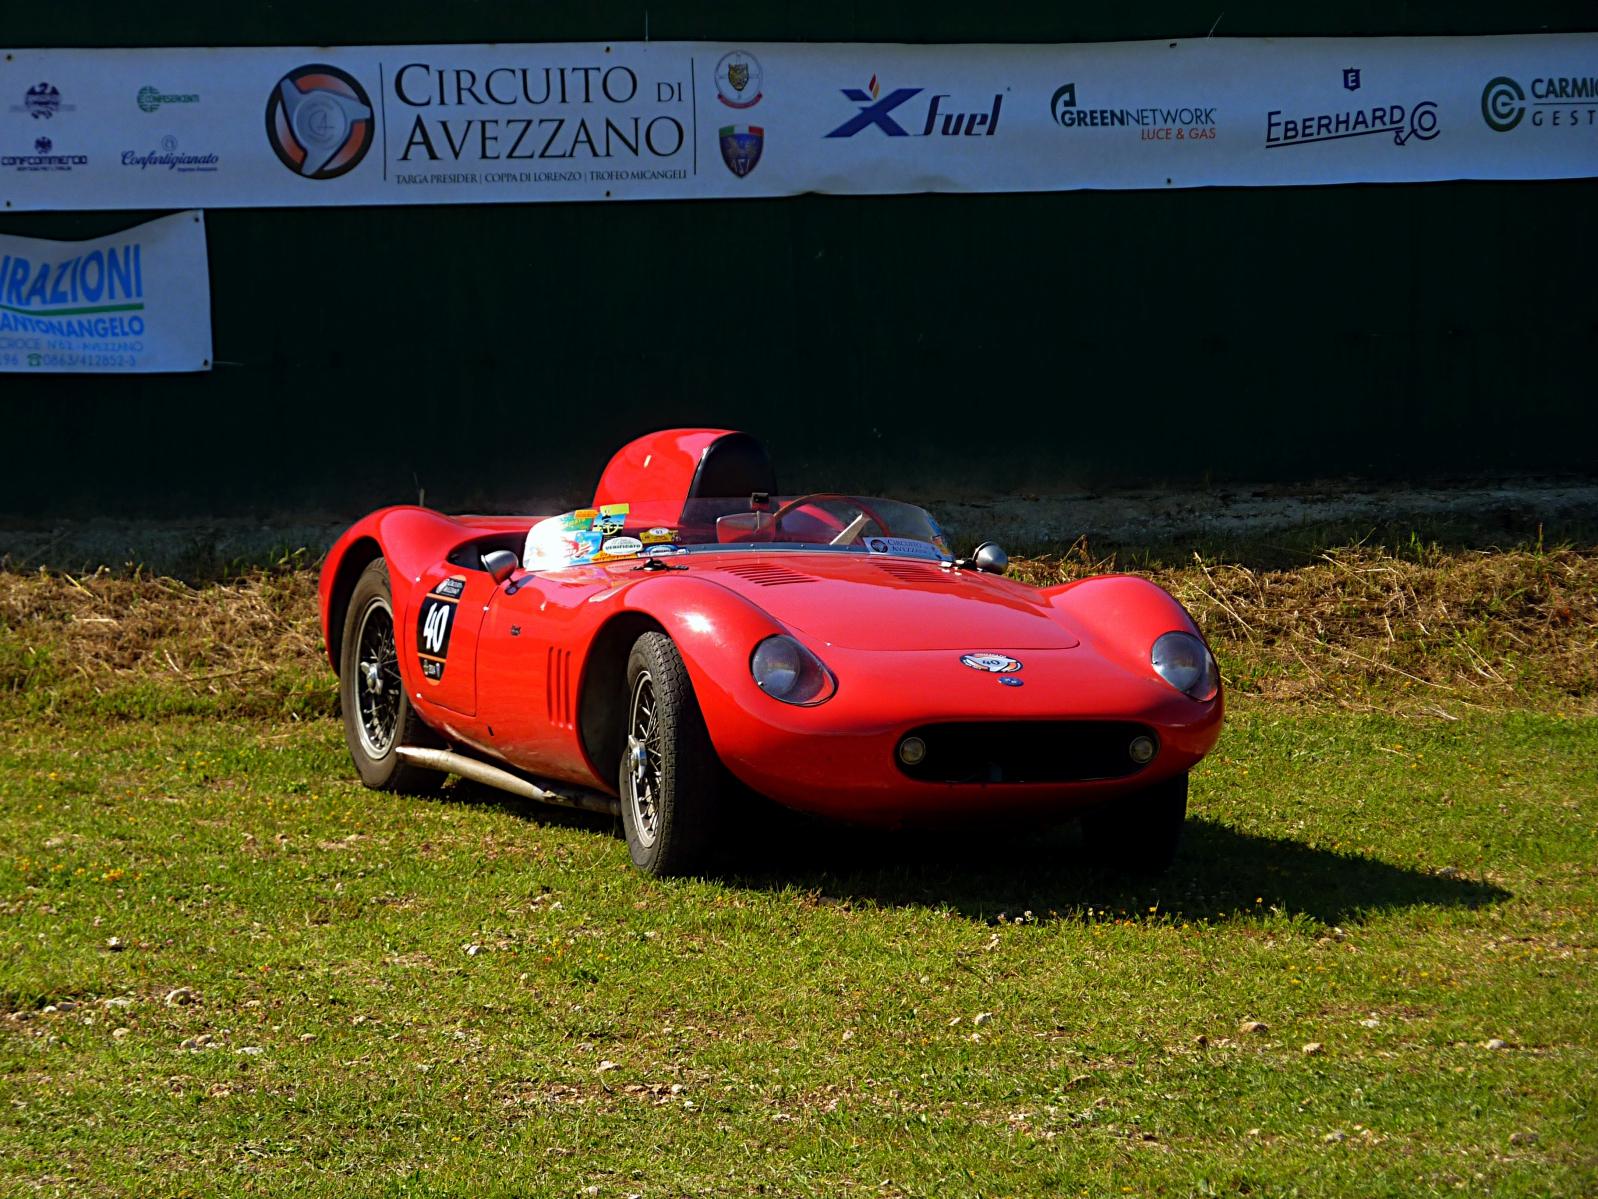 1958 OSCA Maserati 372 F2